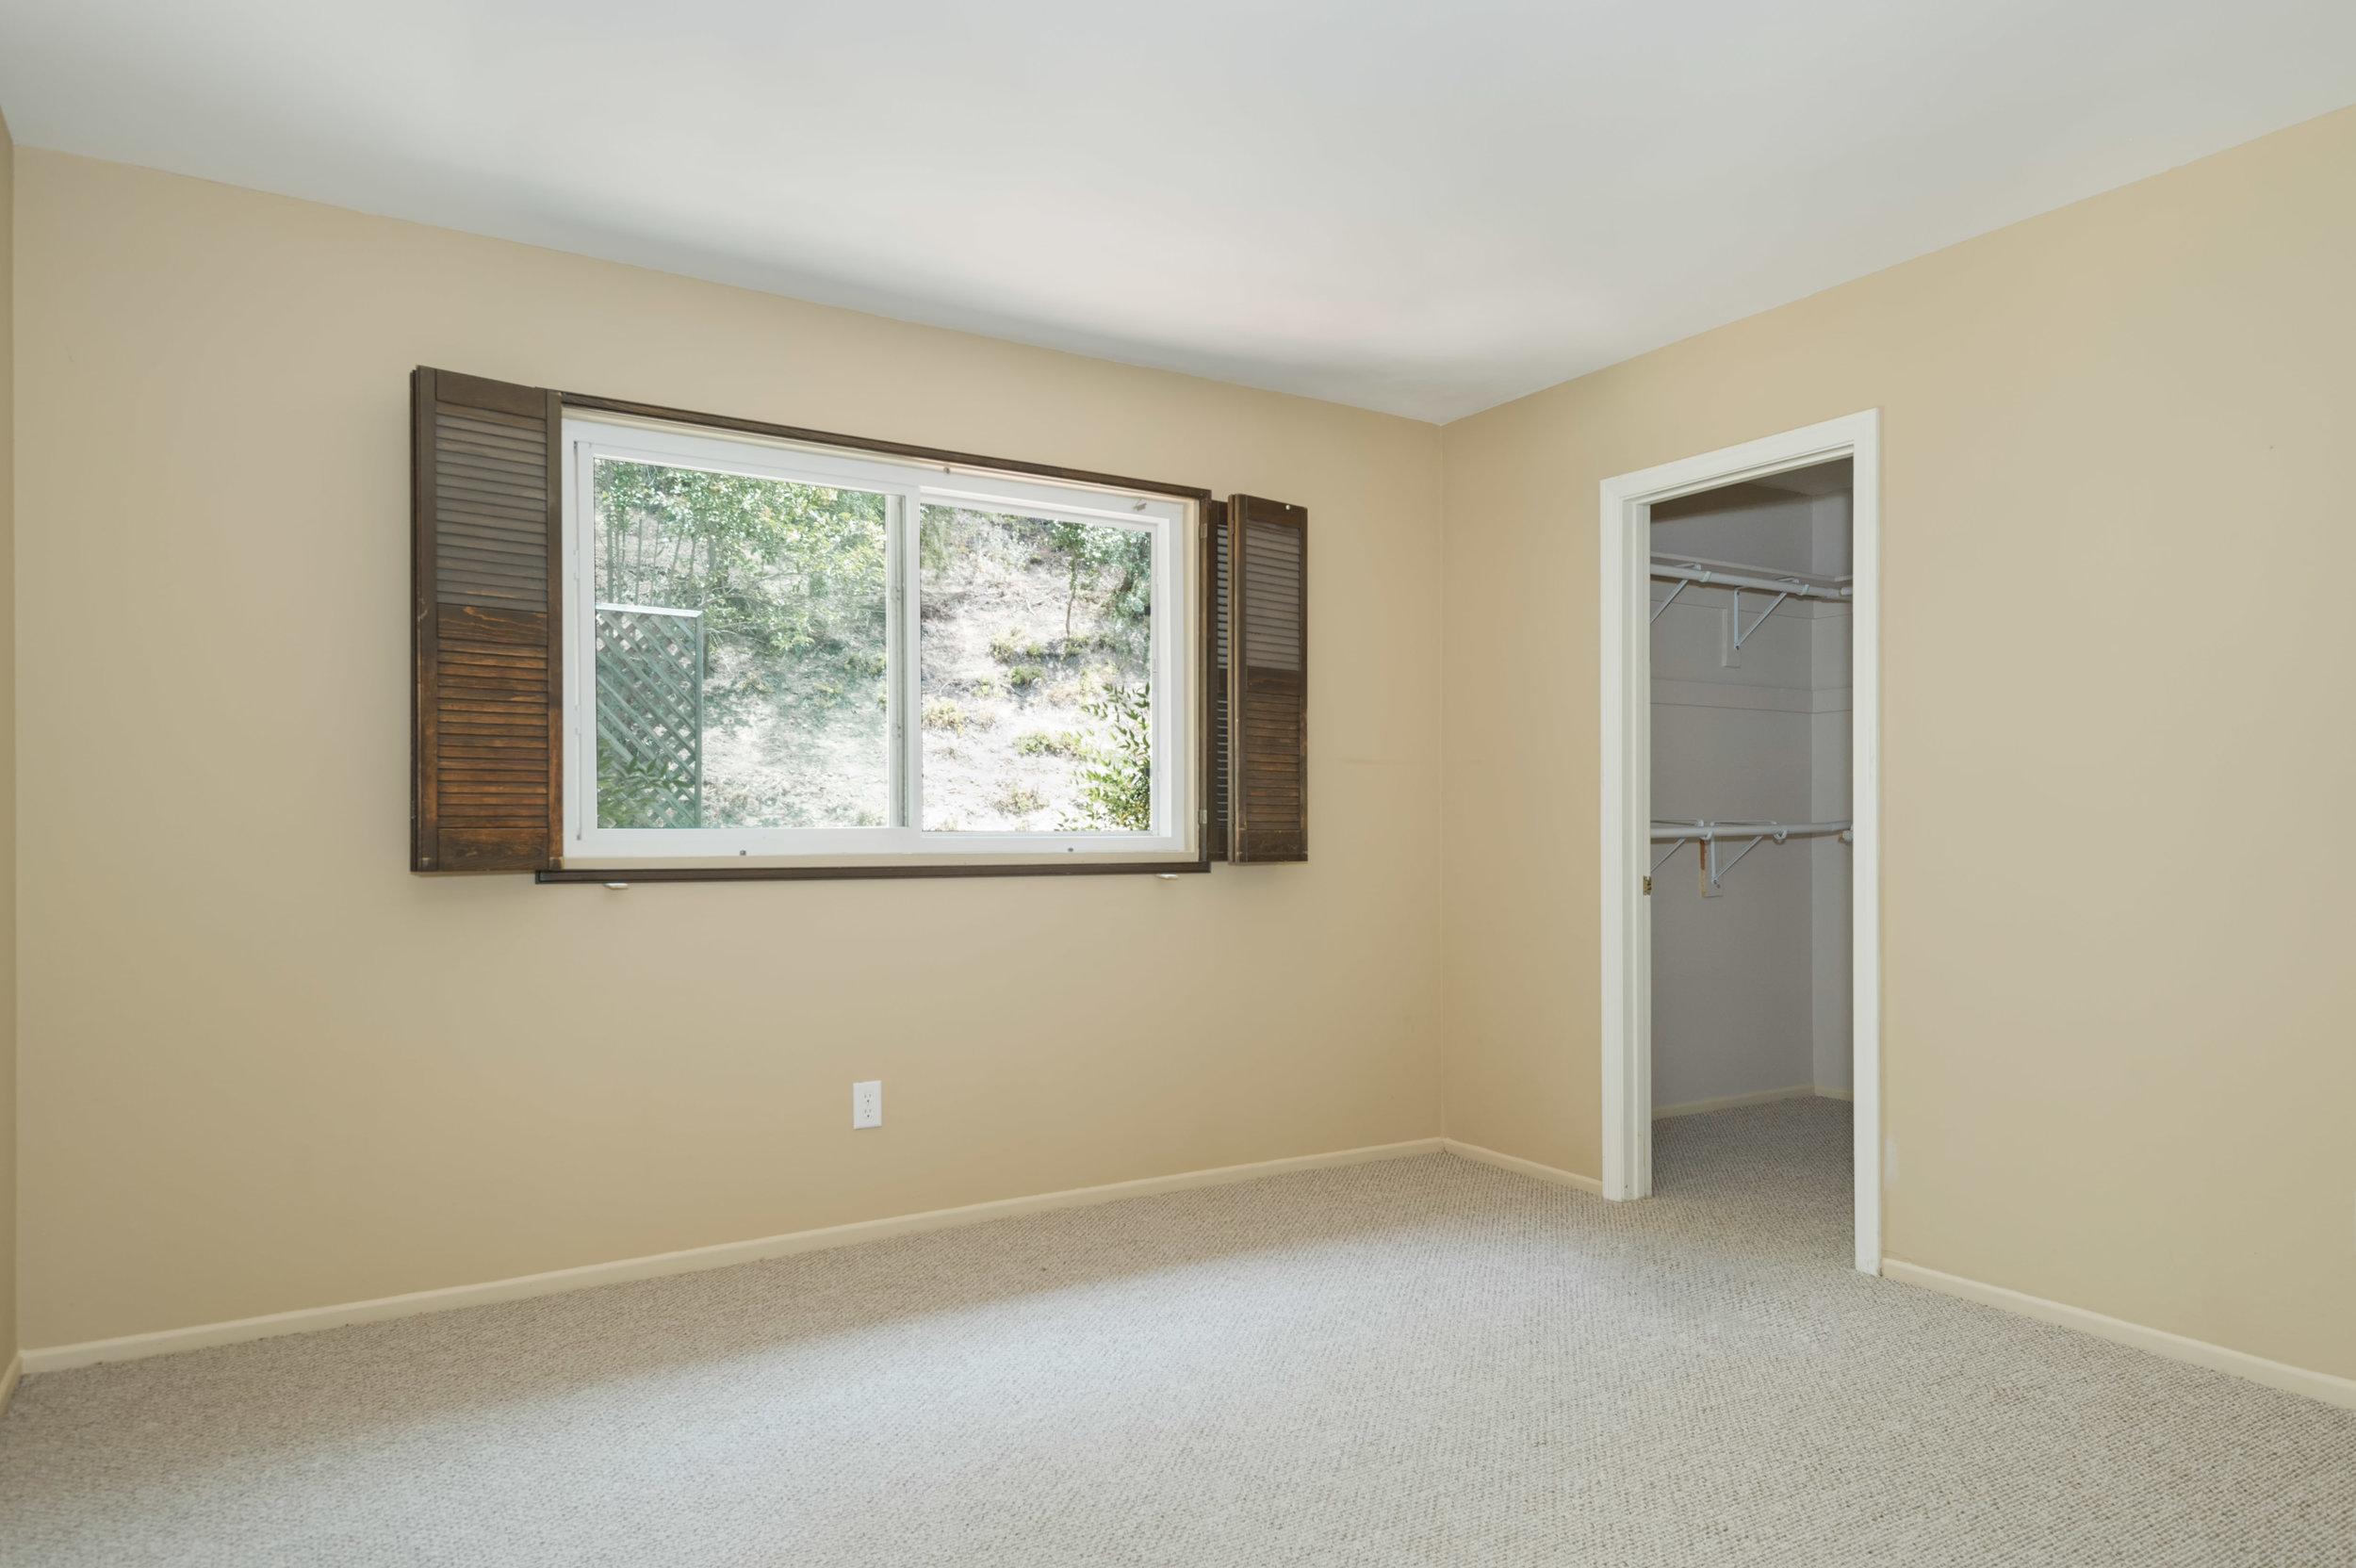 017 bedroom 8832 Moorcroft Avenue West Hills For Sale Lease The Malibu Life Team Luxury Real Estate.jpg